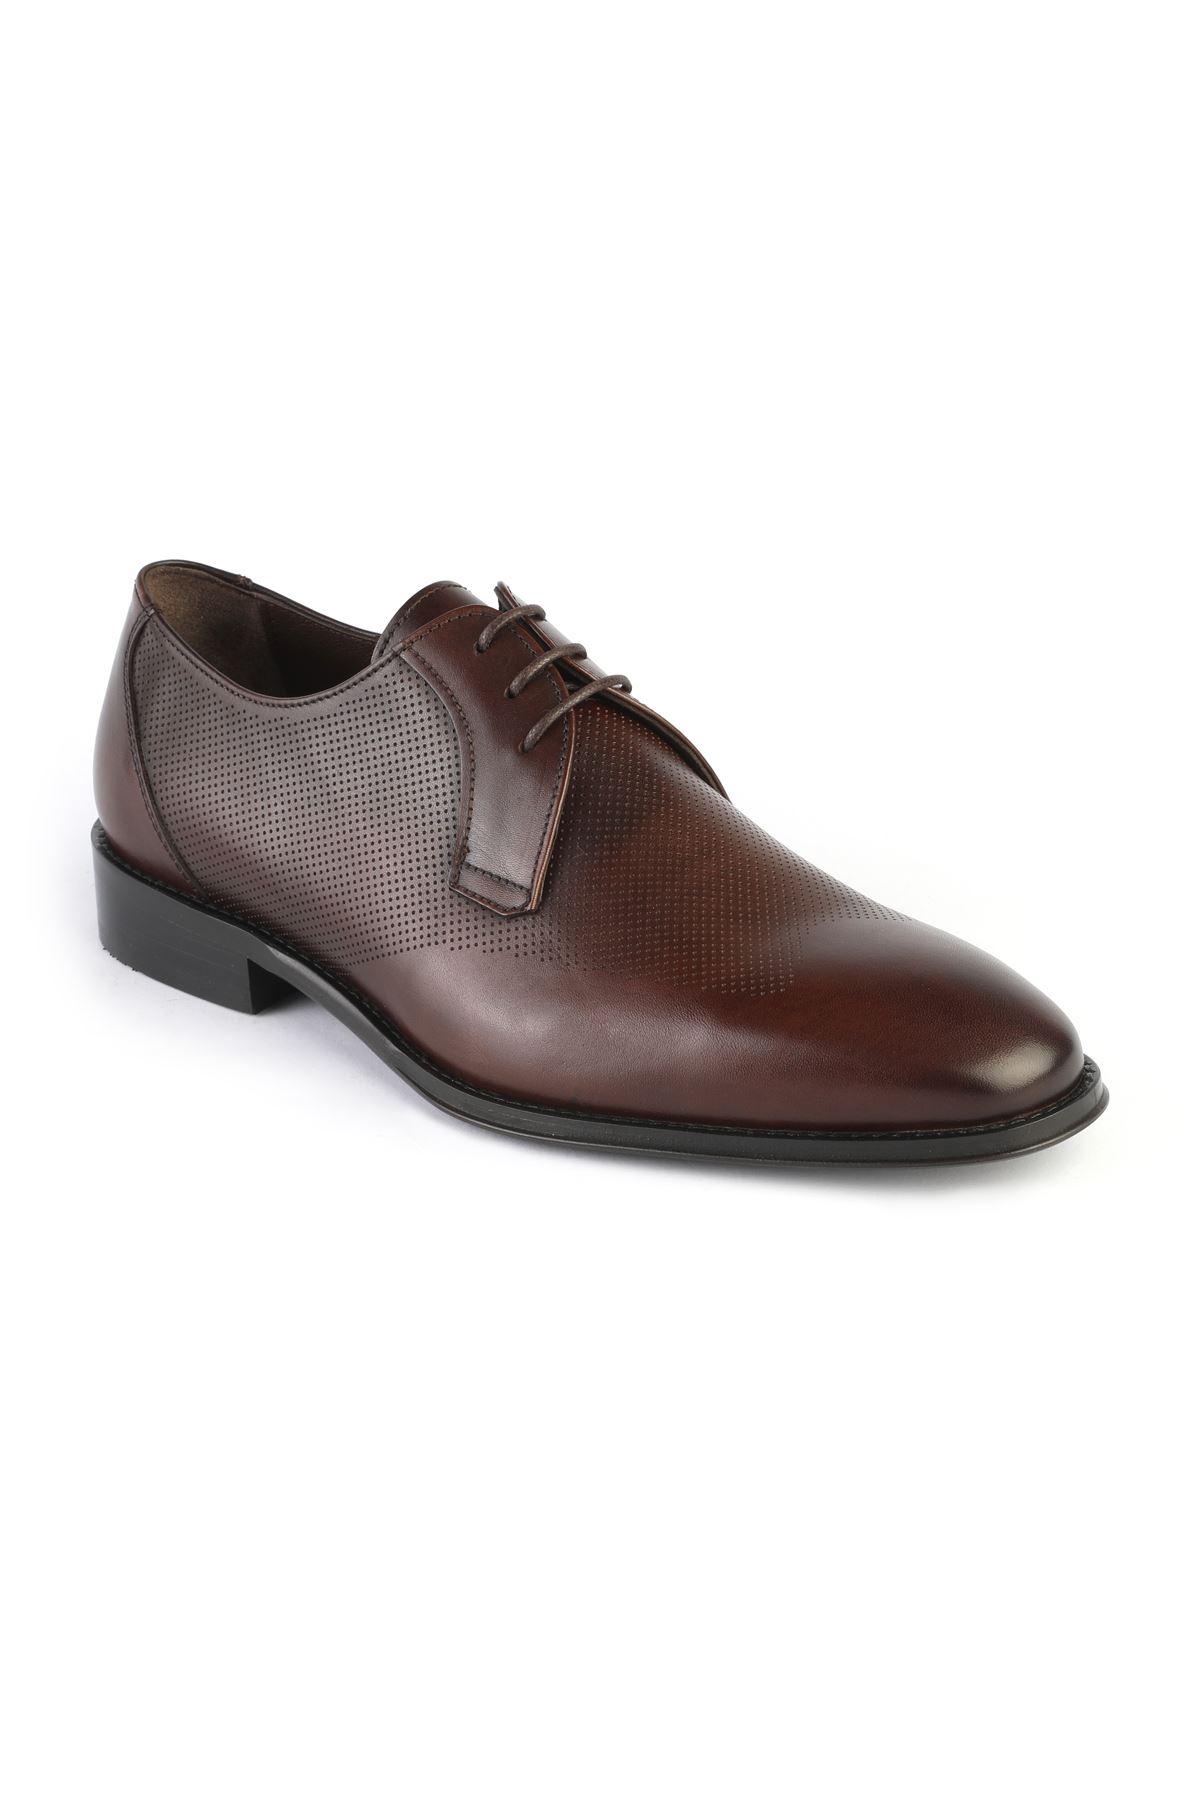 Libero 2725 Brown Classic Shoes